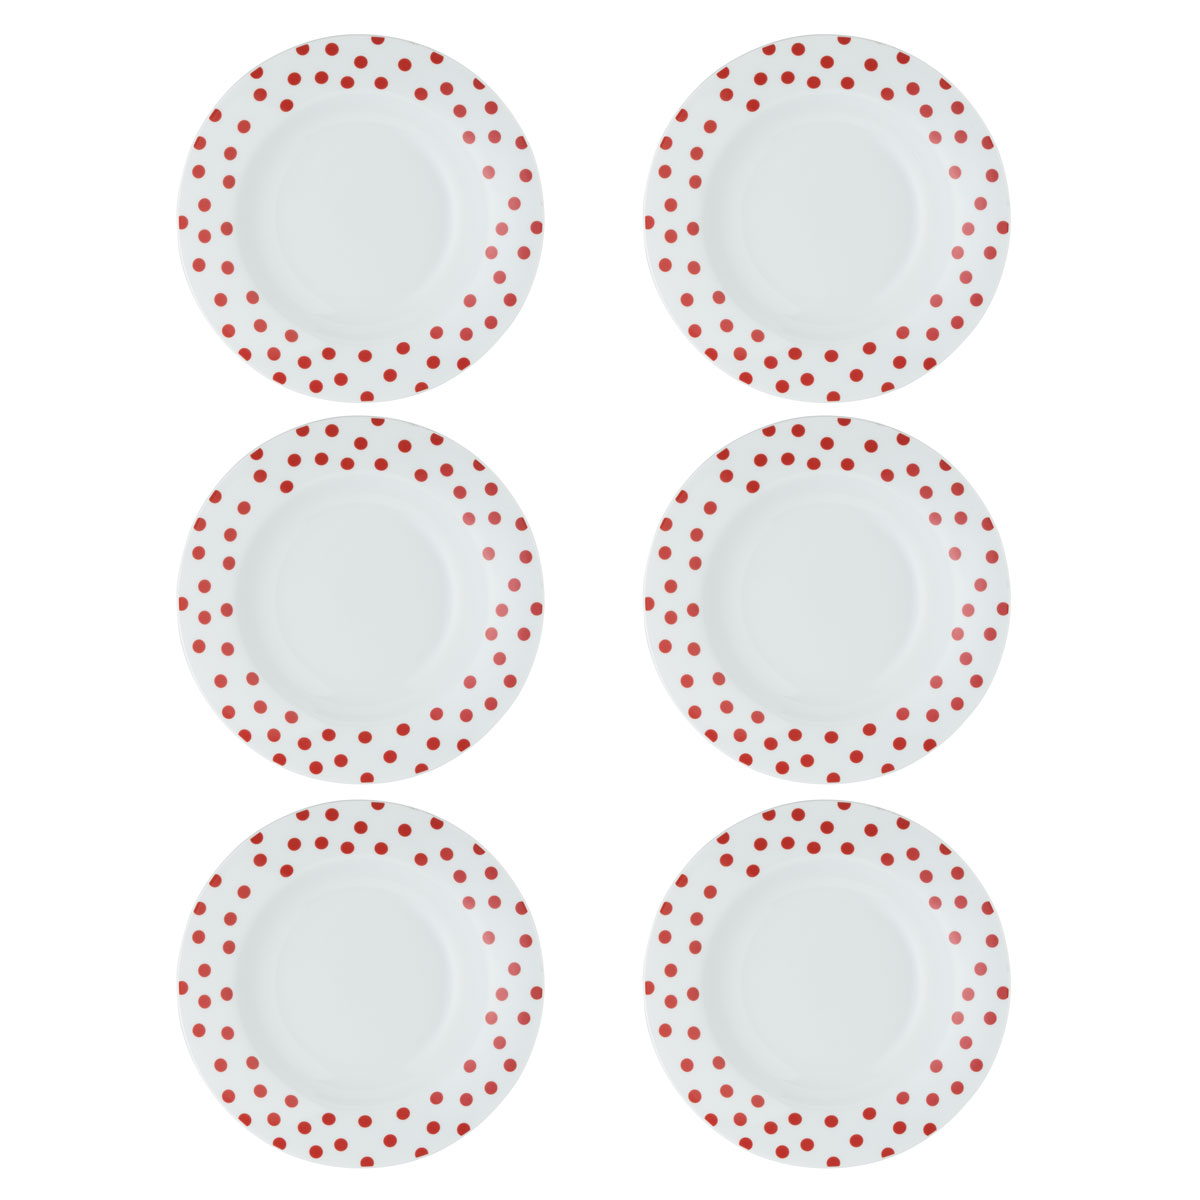 6 suppenteller vichy dots rot teller tief 23 cm porzellanteller rote punkte ebay. Black Bedroom Furniture Sets. Home Design Ideas